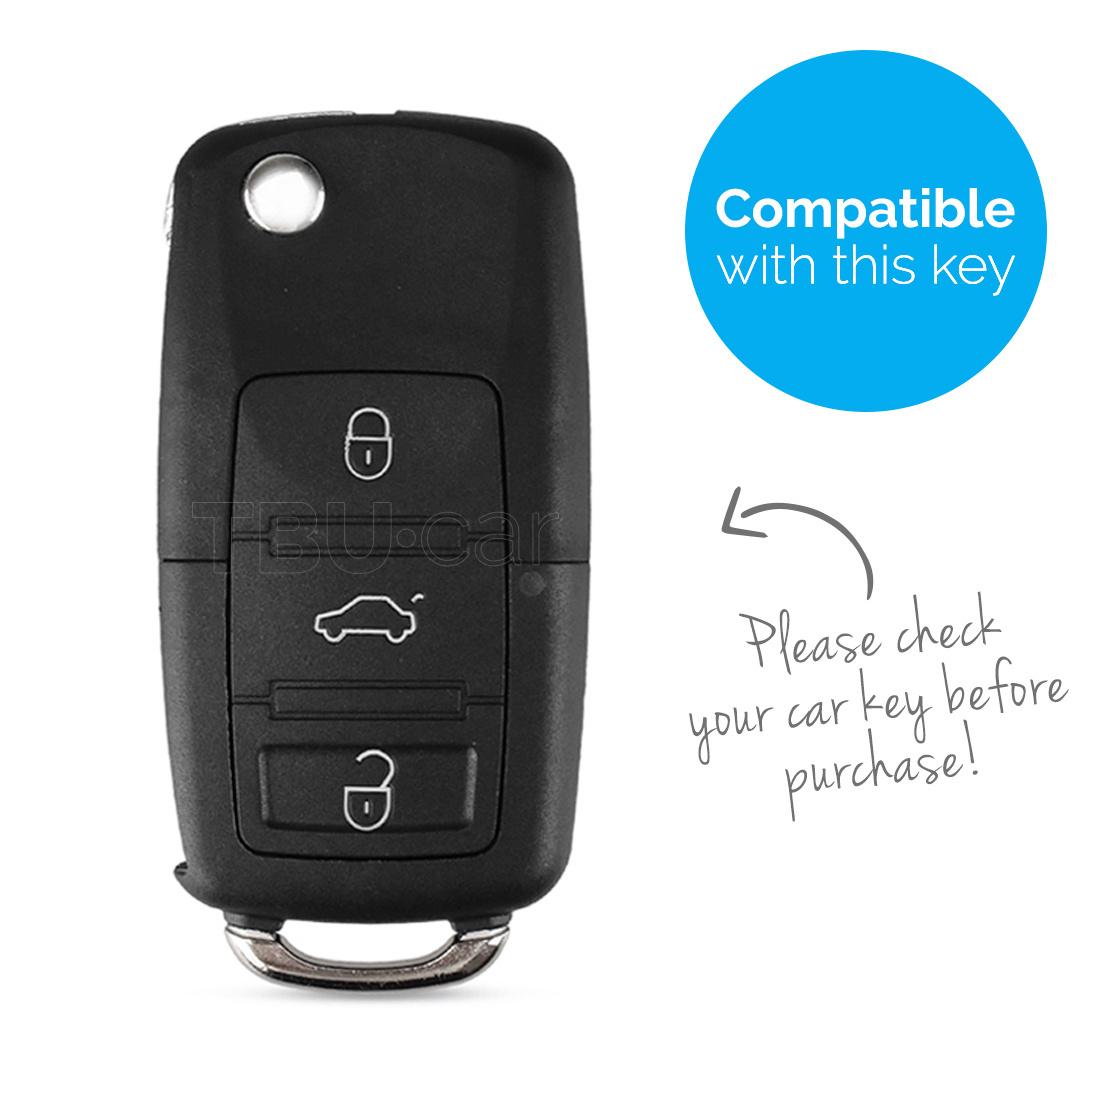 TBU car Audi Sleutel Cover - Silicone sleutelhoesje - beschermhoesje autosleutel - Roze